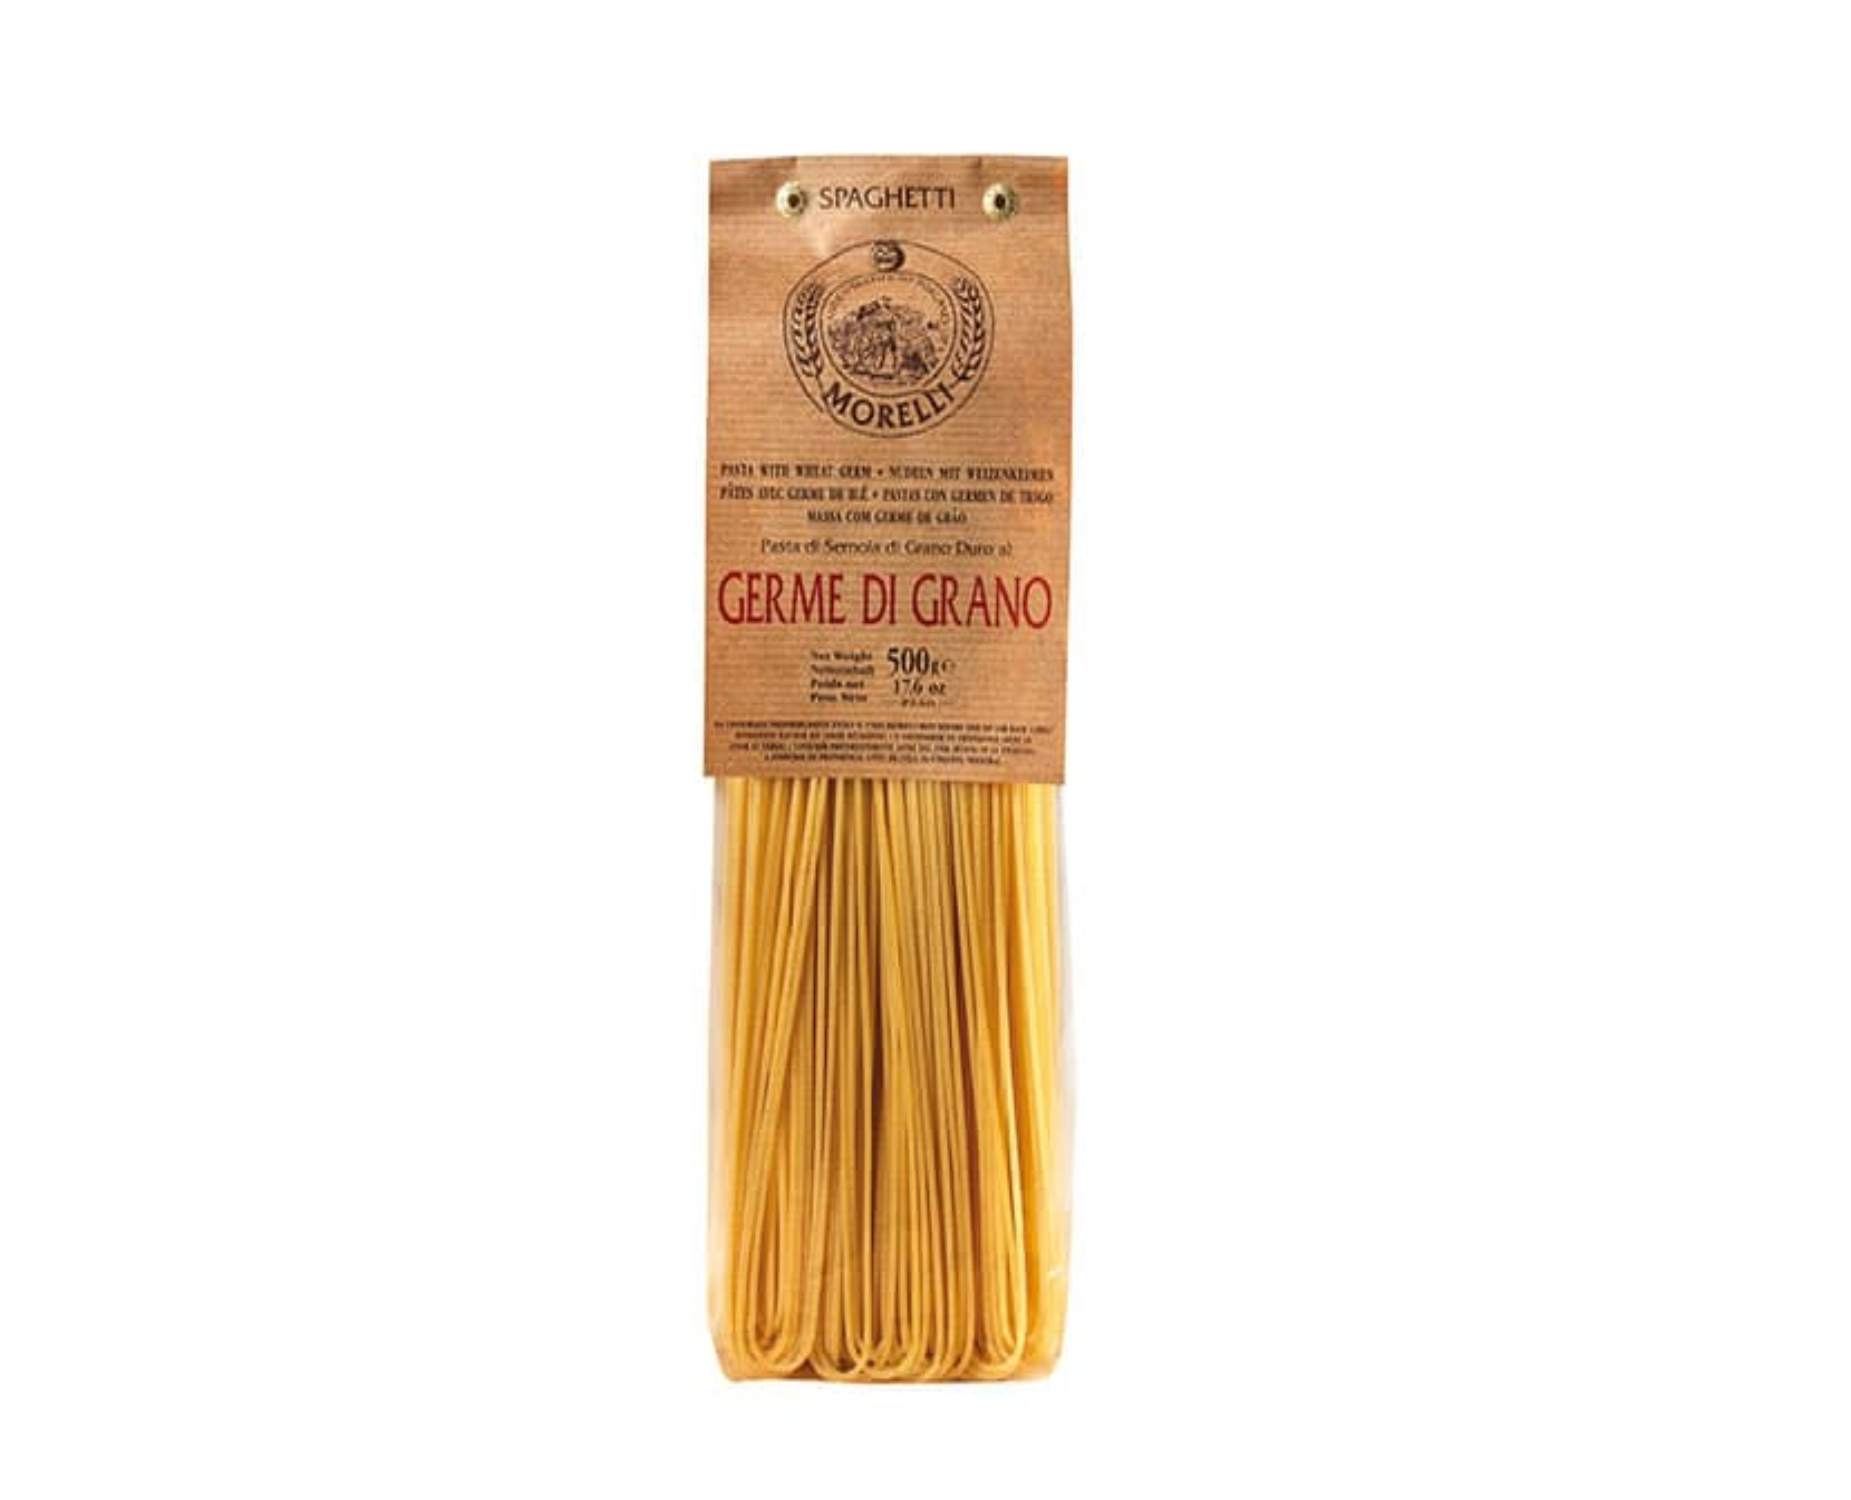 Spaghetti with Wheat Germ Italian Pasta Artisanal Made in Italy Long Shape